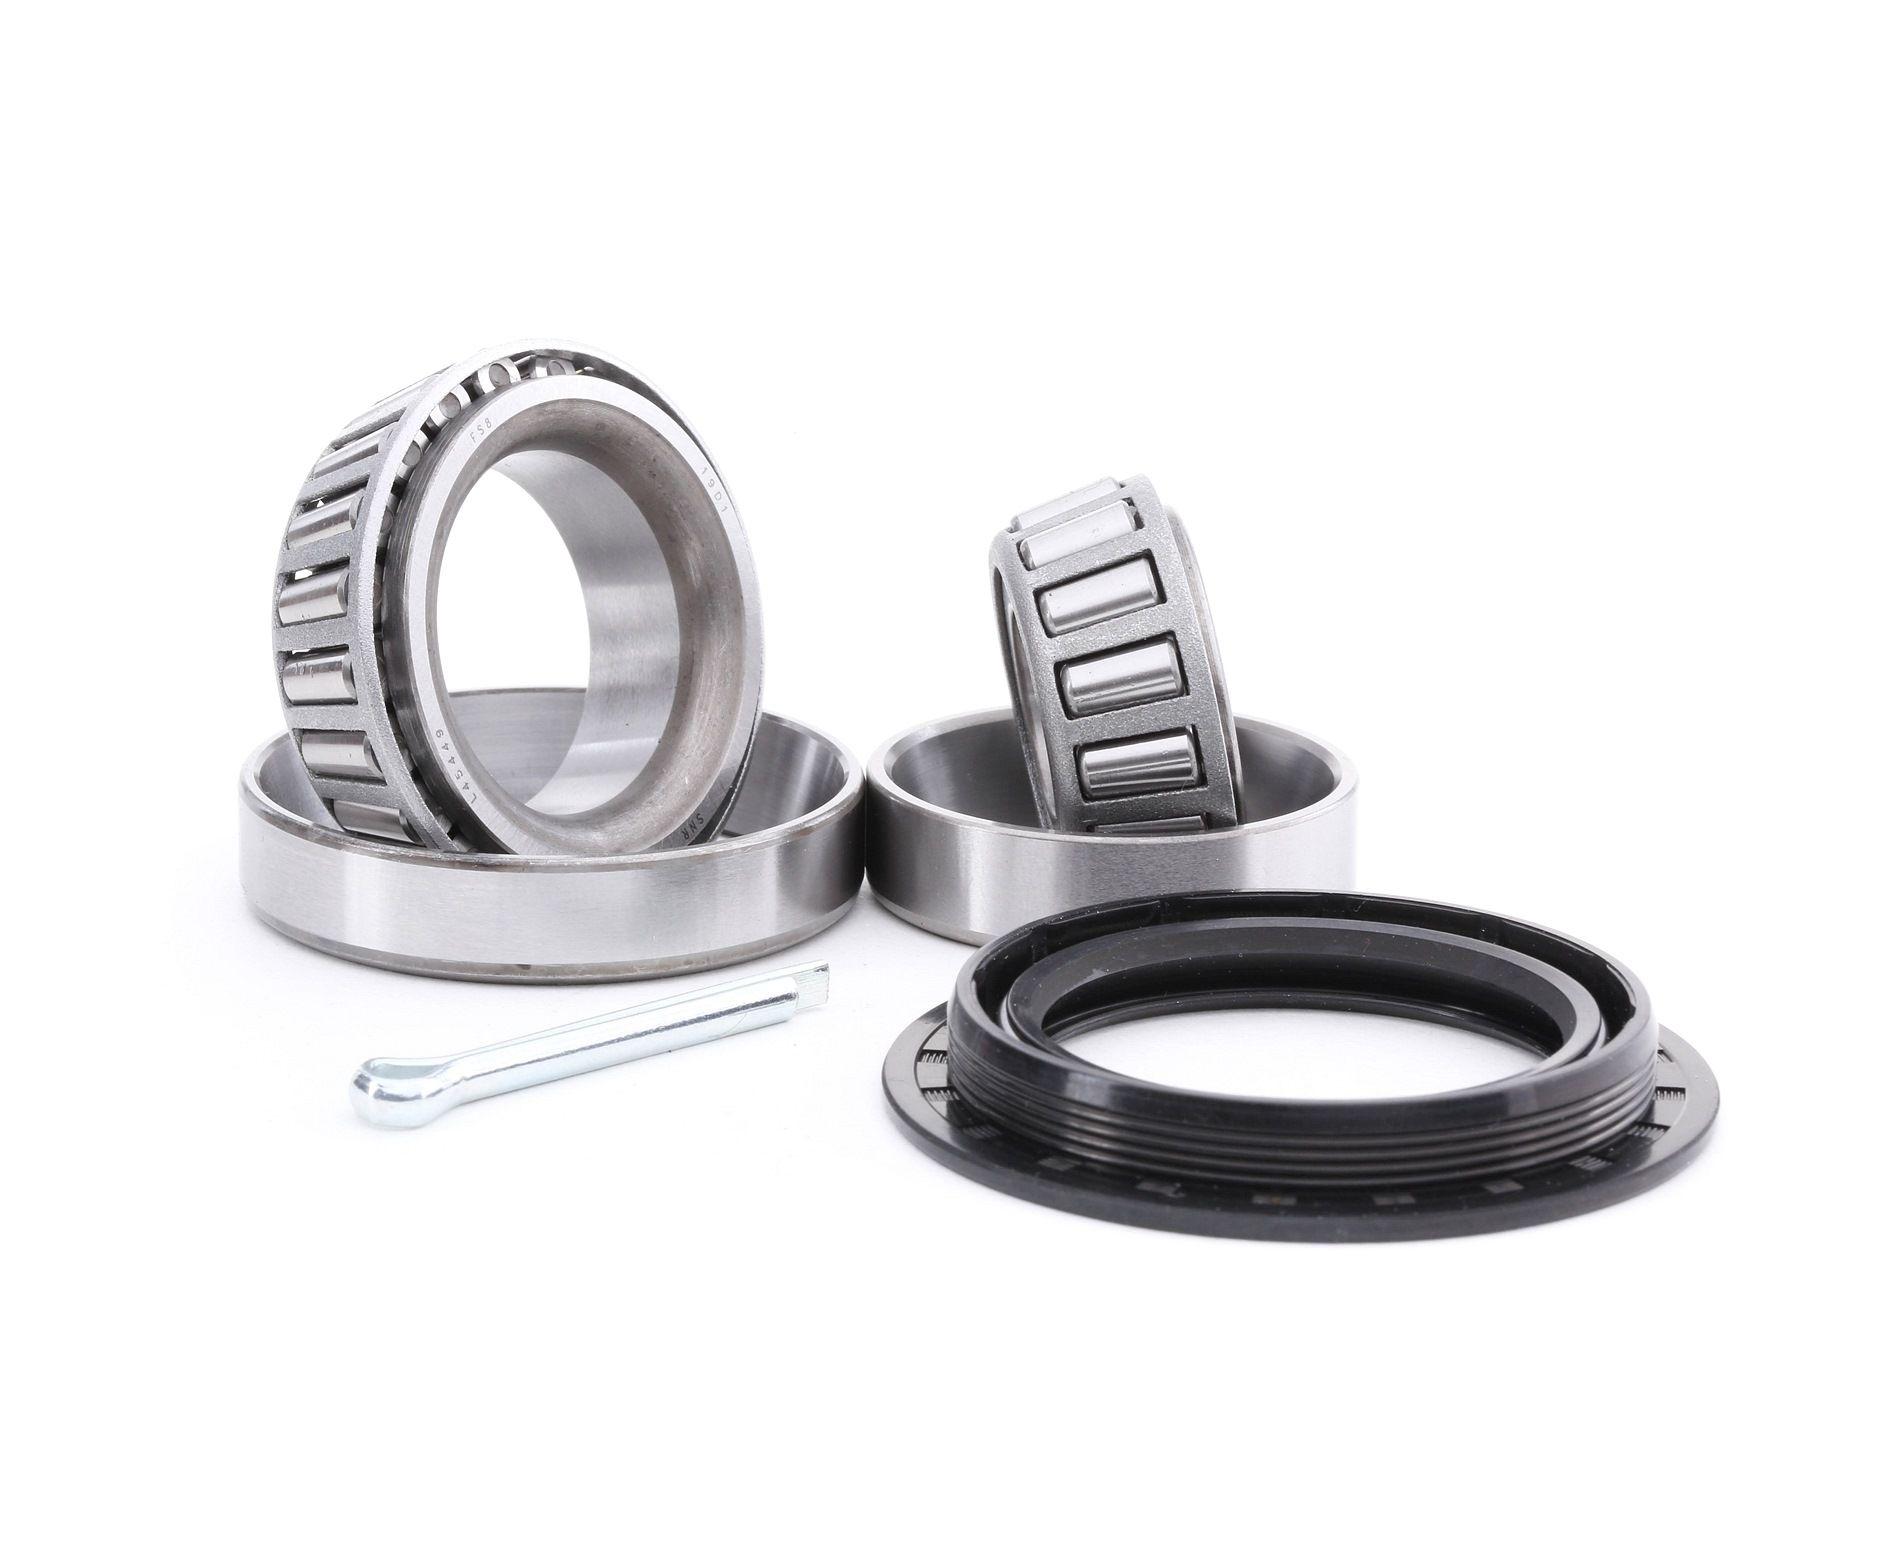 Wheel Bearing SNR R153.07 rating